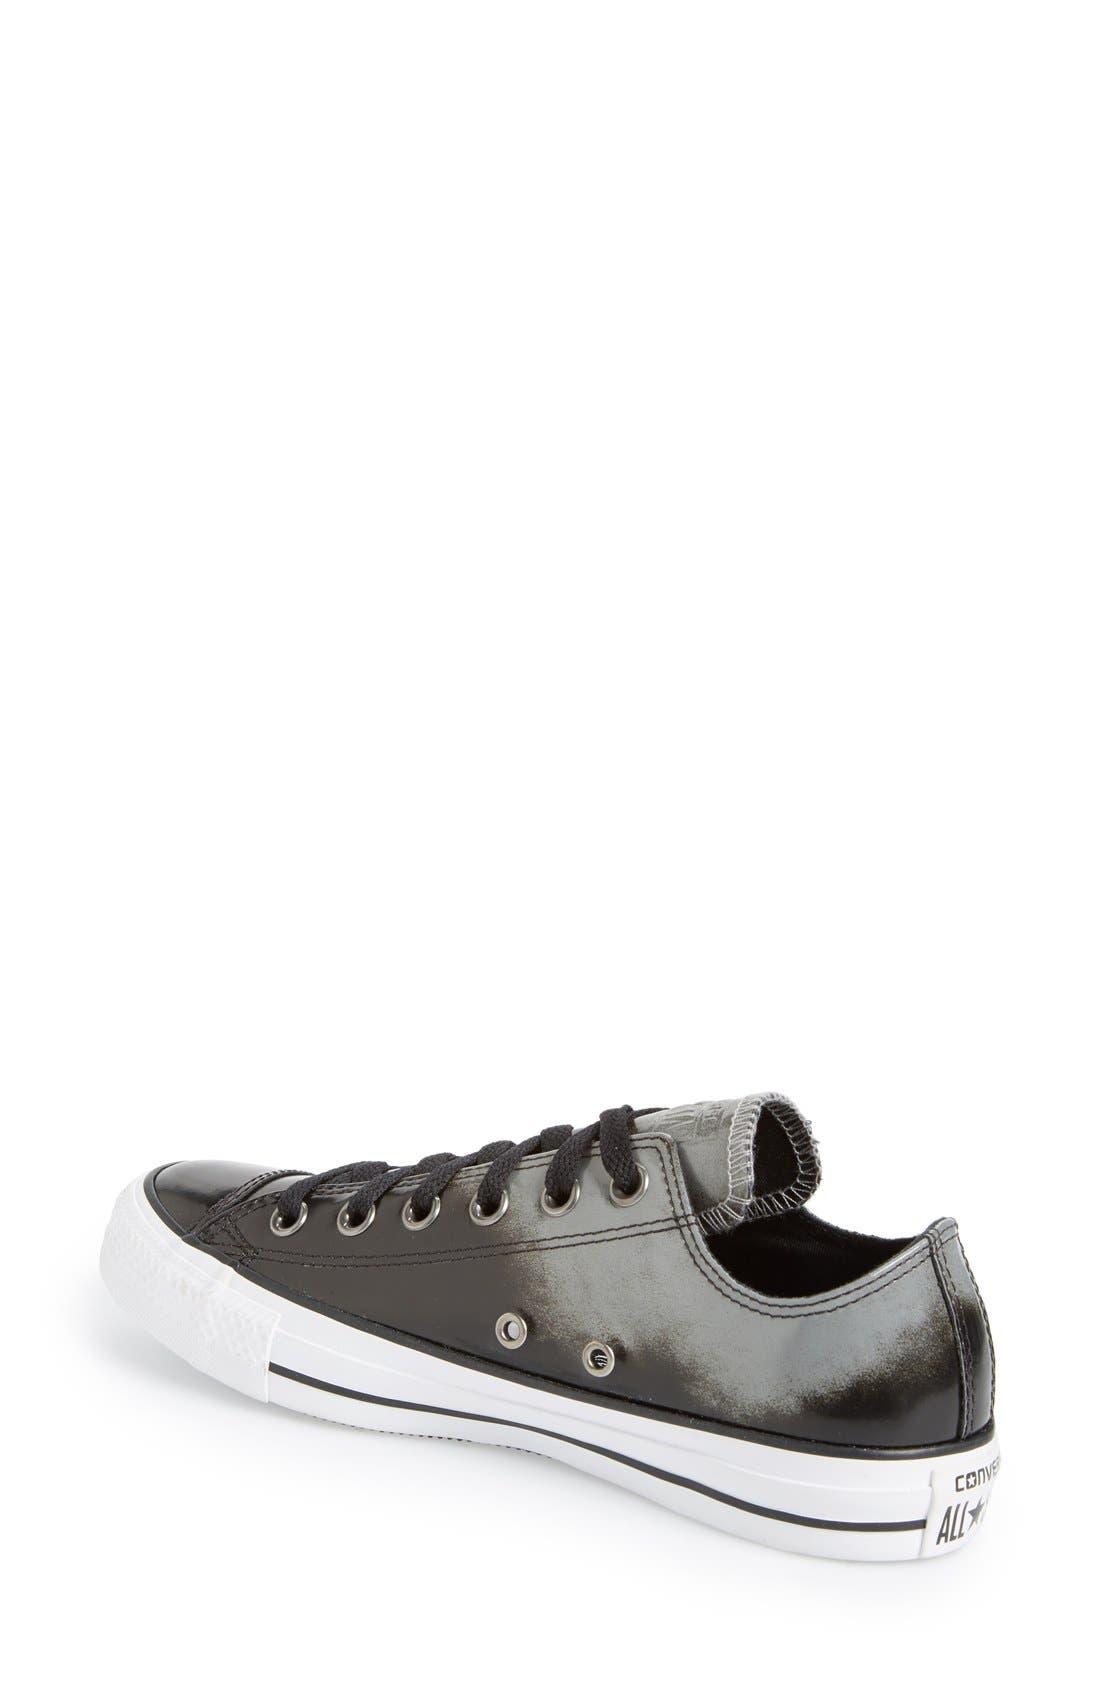 Alternate Image 2  - Converse All Star®Chuck Taylor® 'OmbréOx' Sneaker (Women)